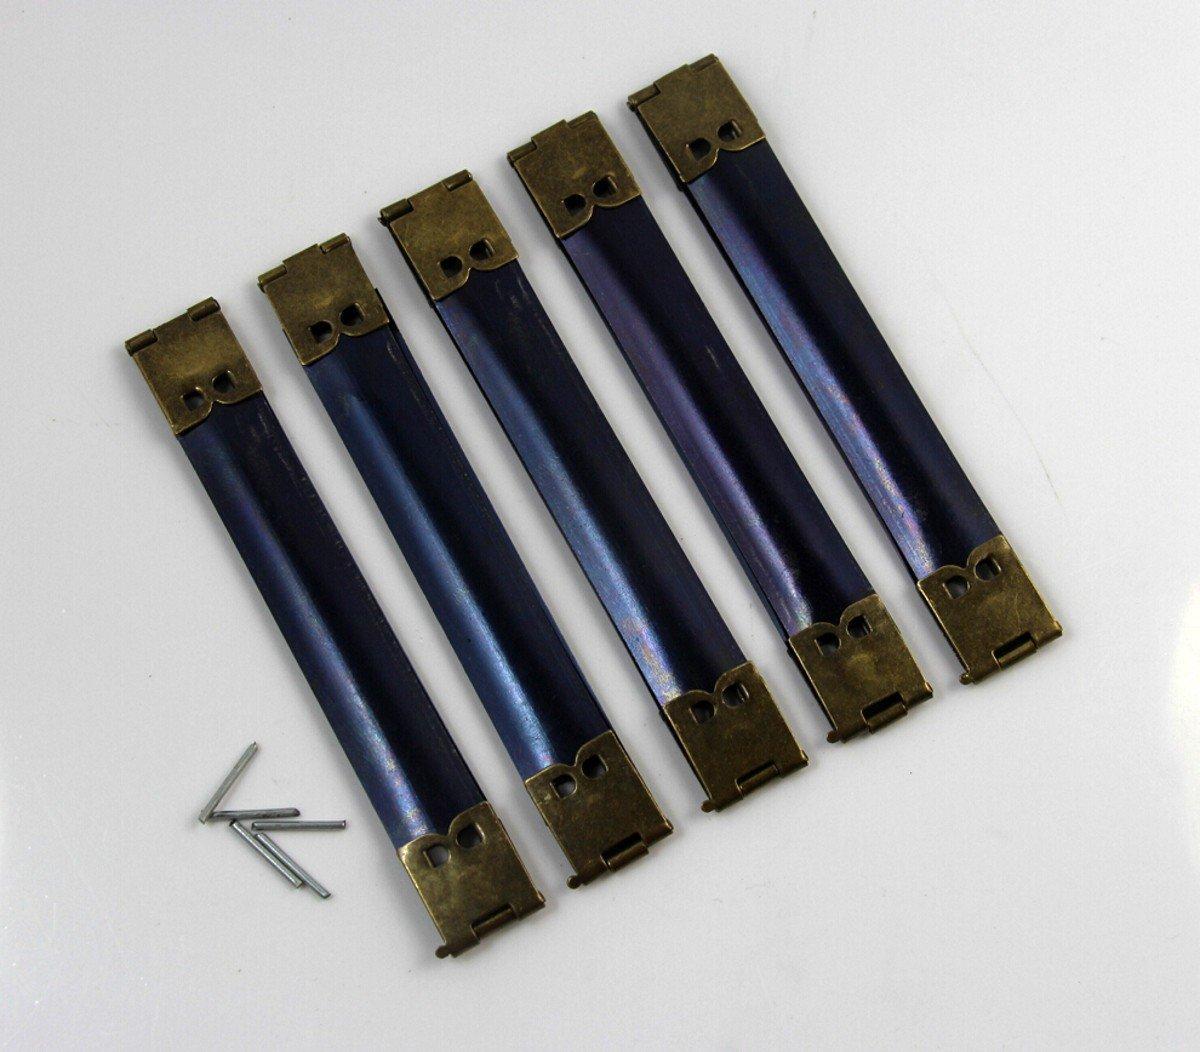 chengyida 20unidades Metal interno Flex Marcos Lot Kiss cierre bolsa Monedero (10cm) Ltd.